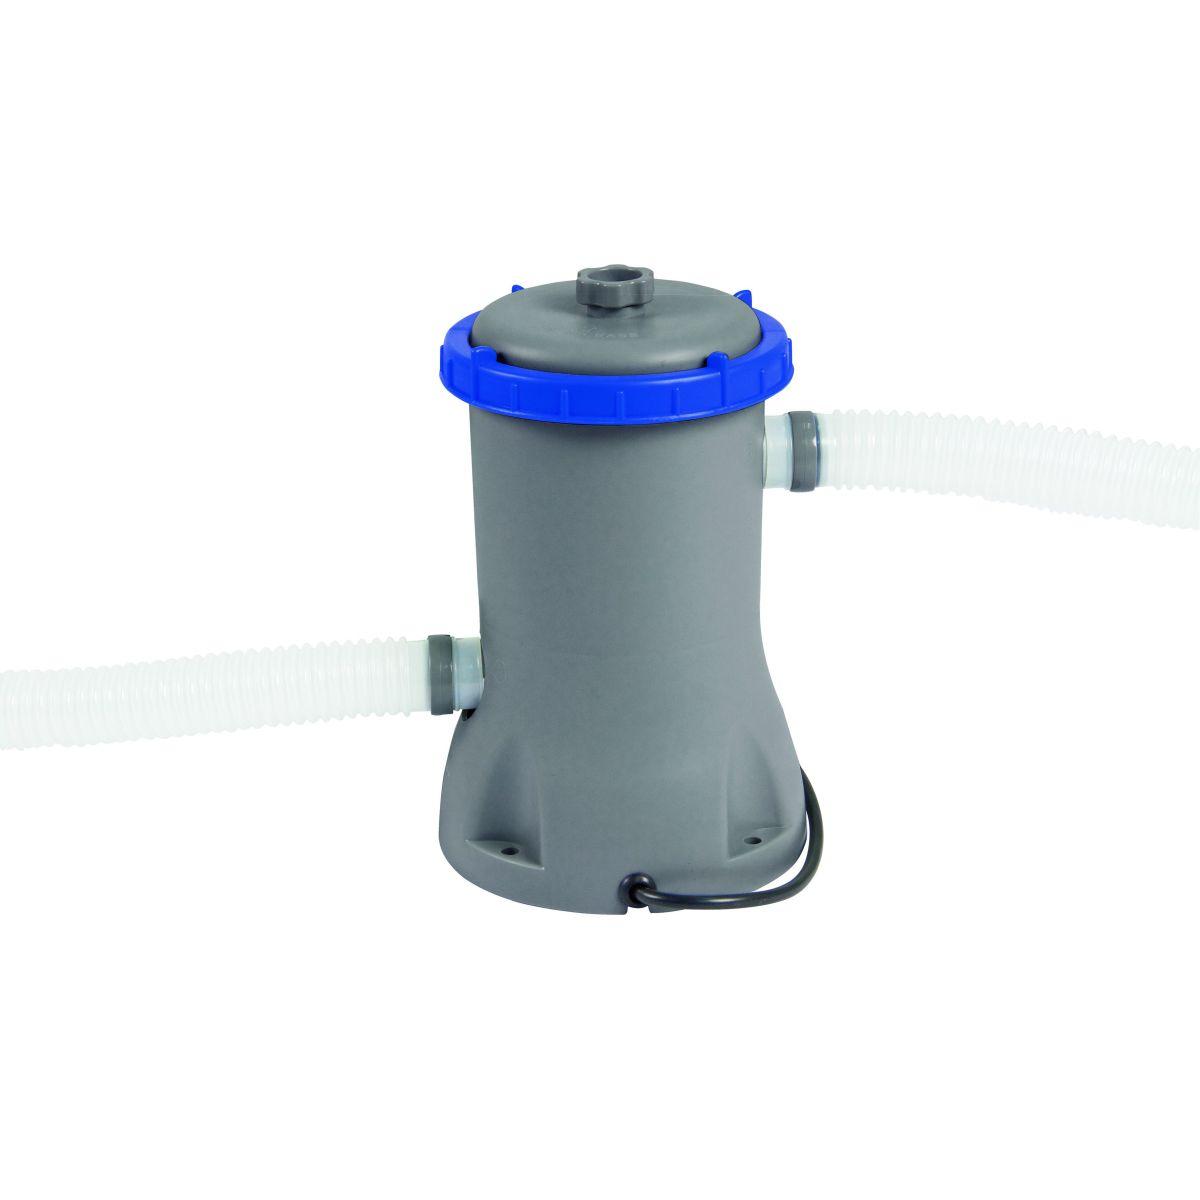 Bestway pompa a cartuccia Flowclear™ 2,006l/h